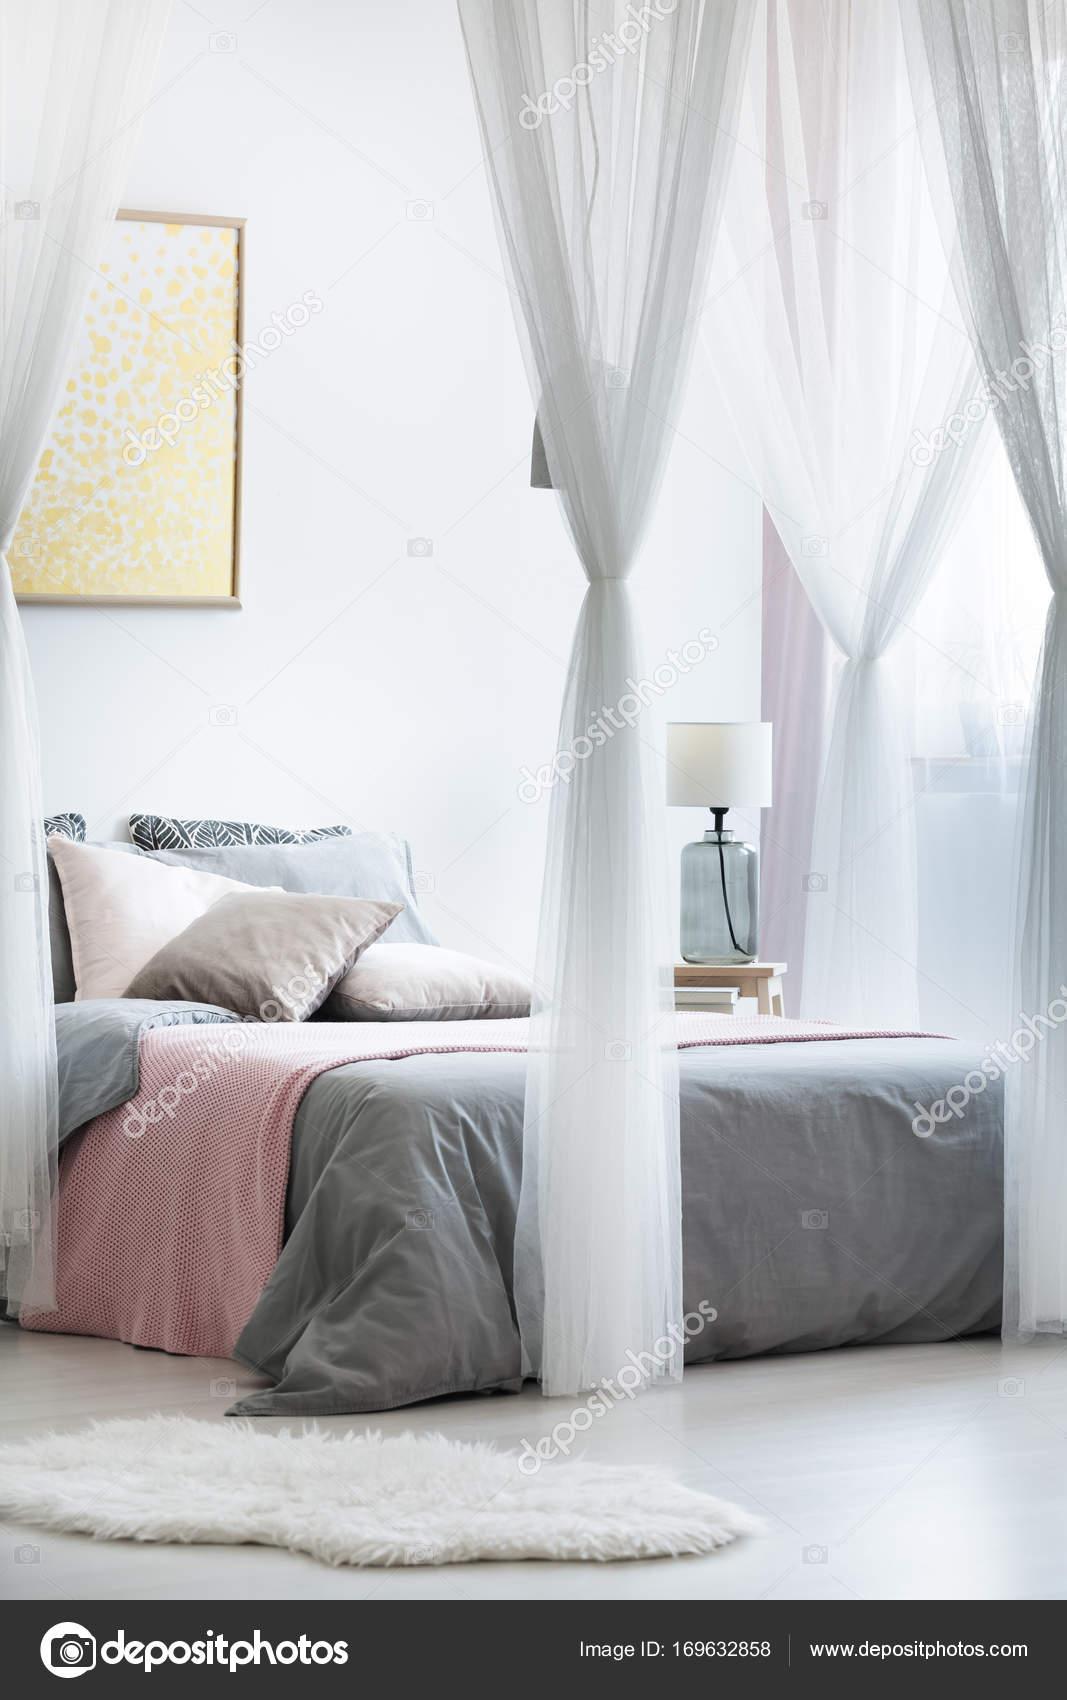 https://st3.depositphotos.com/2249091/16963/i/1600/depositphotos_169632858-stock-photo-gold-painting-in-canopy-bedroom.jpg